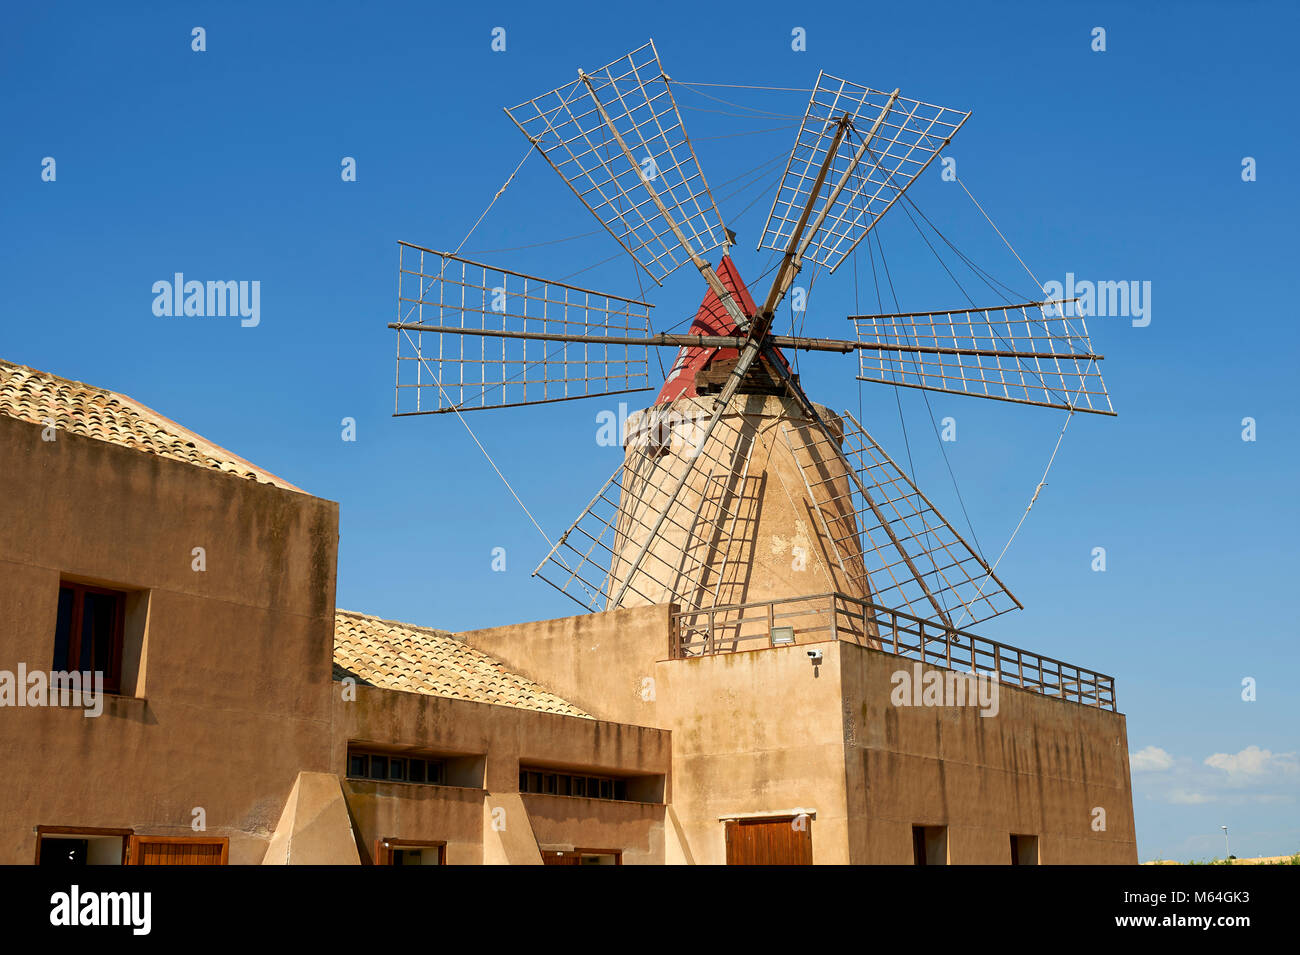 Mulino d'Infersa (molino de viento Molino Infersa), Ettore salinas, della Laguna salina, Masala, Sicilia. Imagen De Stock